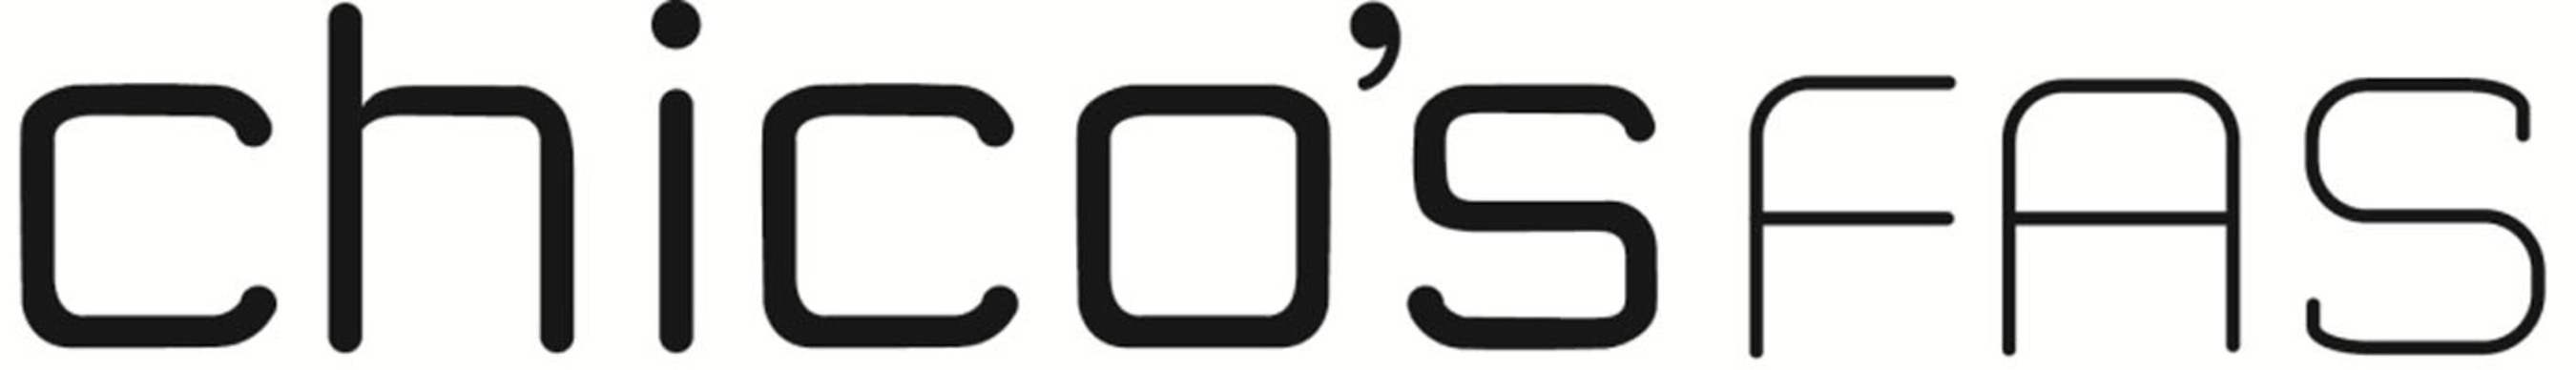 Chico's FAS Logo.